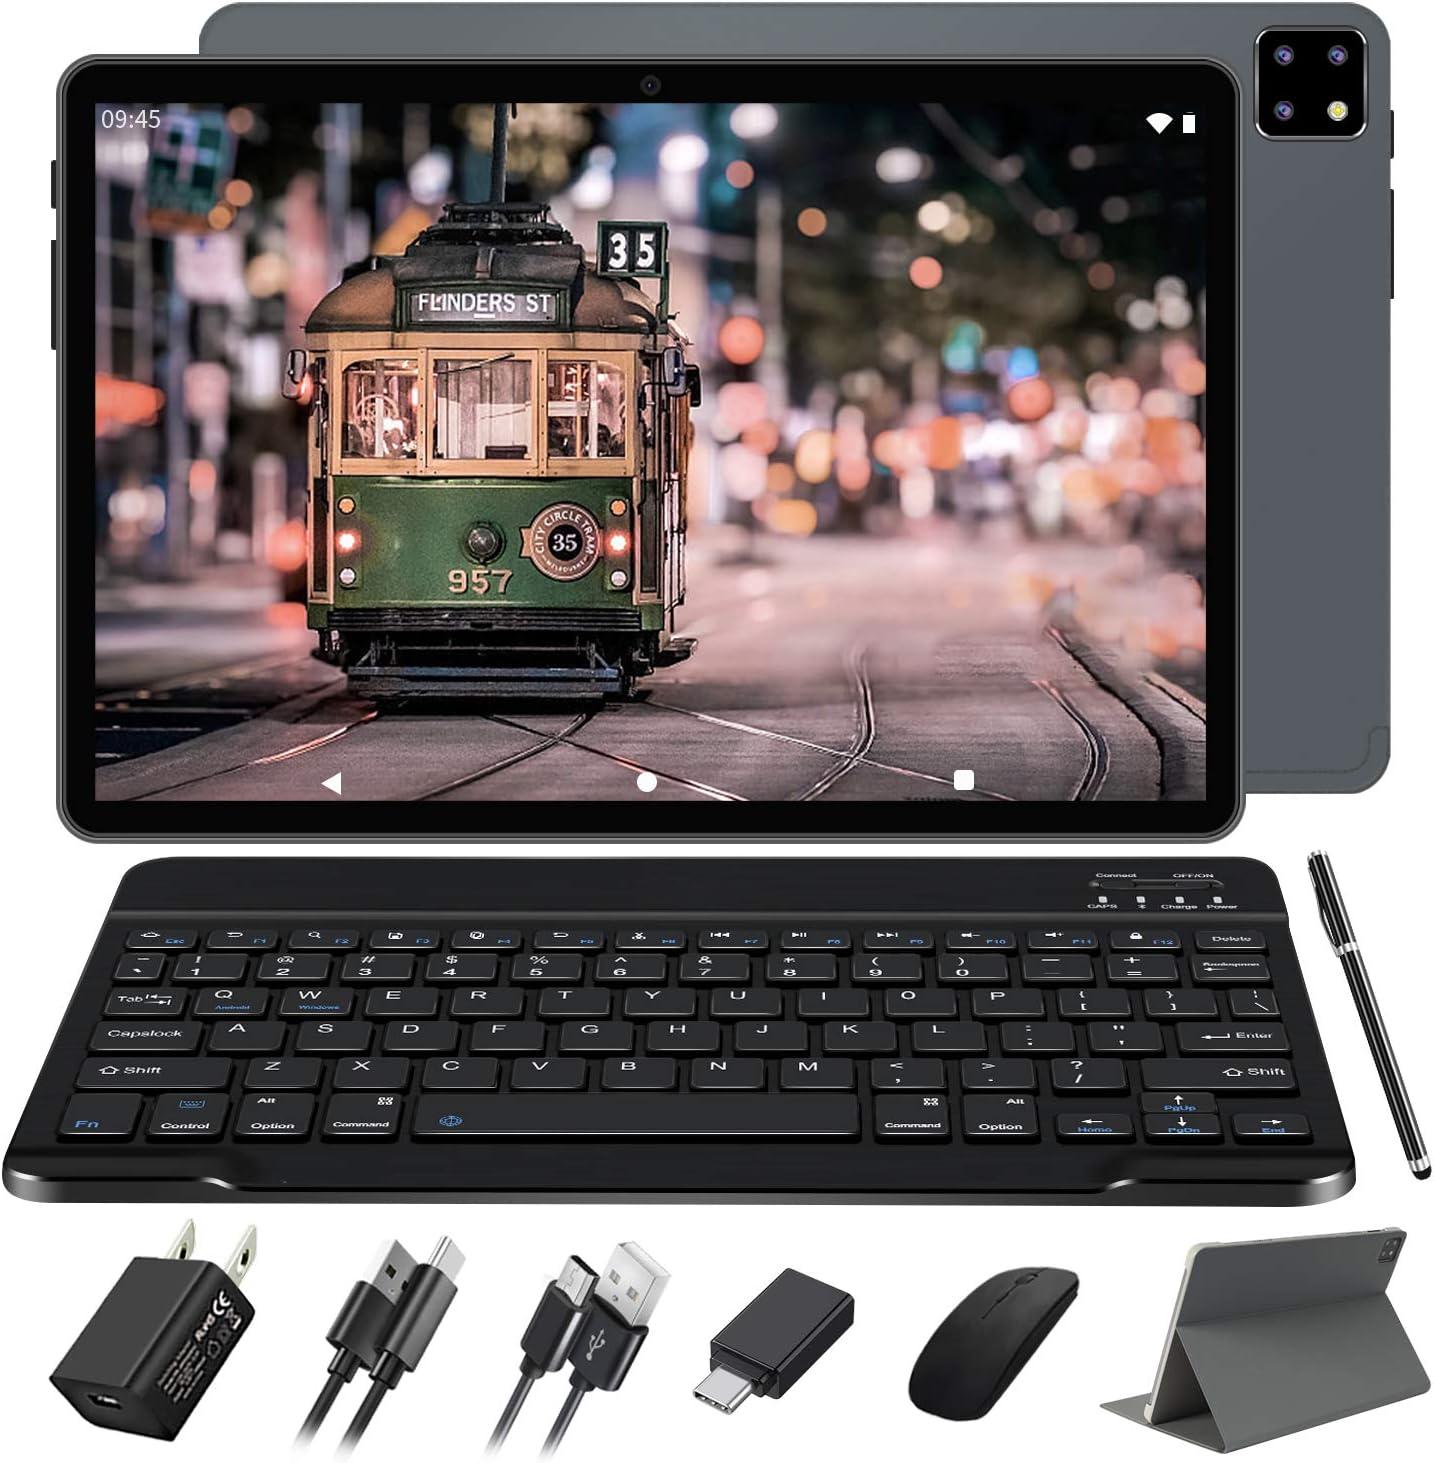 Tablet 10 Pulgadas FACETEL Android 10.0 Tableta 5G Wi-Fi,4GB RAM 64GB ROM (TF 128GB), Octa-Core 1.6 GHz, 1920×1200 FHD IPS Display, Batería 8000mAh,GPS   Bluetooth   WiFi   Teclado y Ratón- Gris